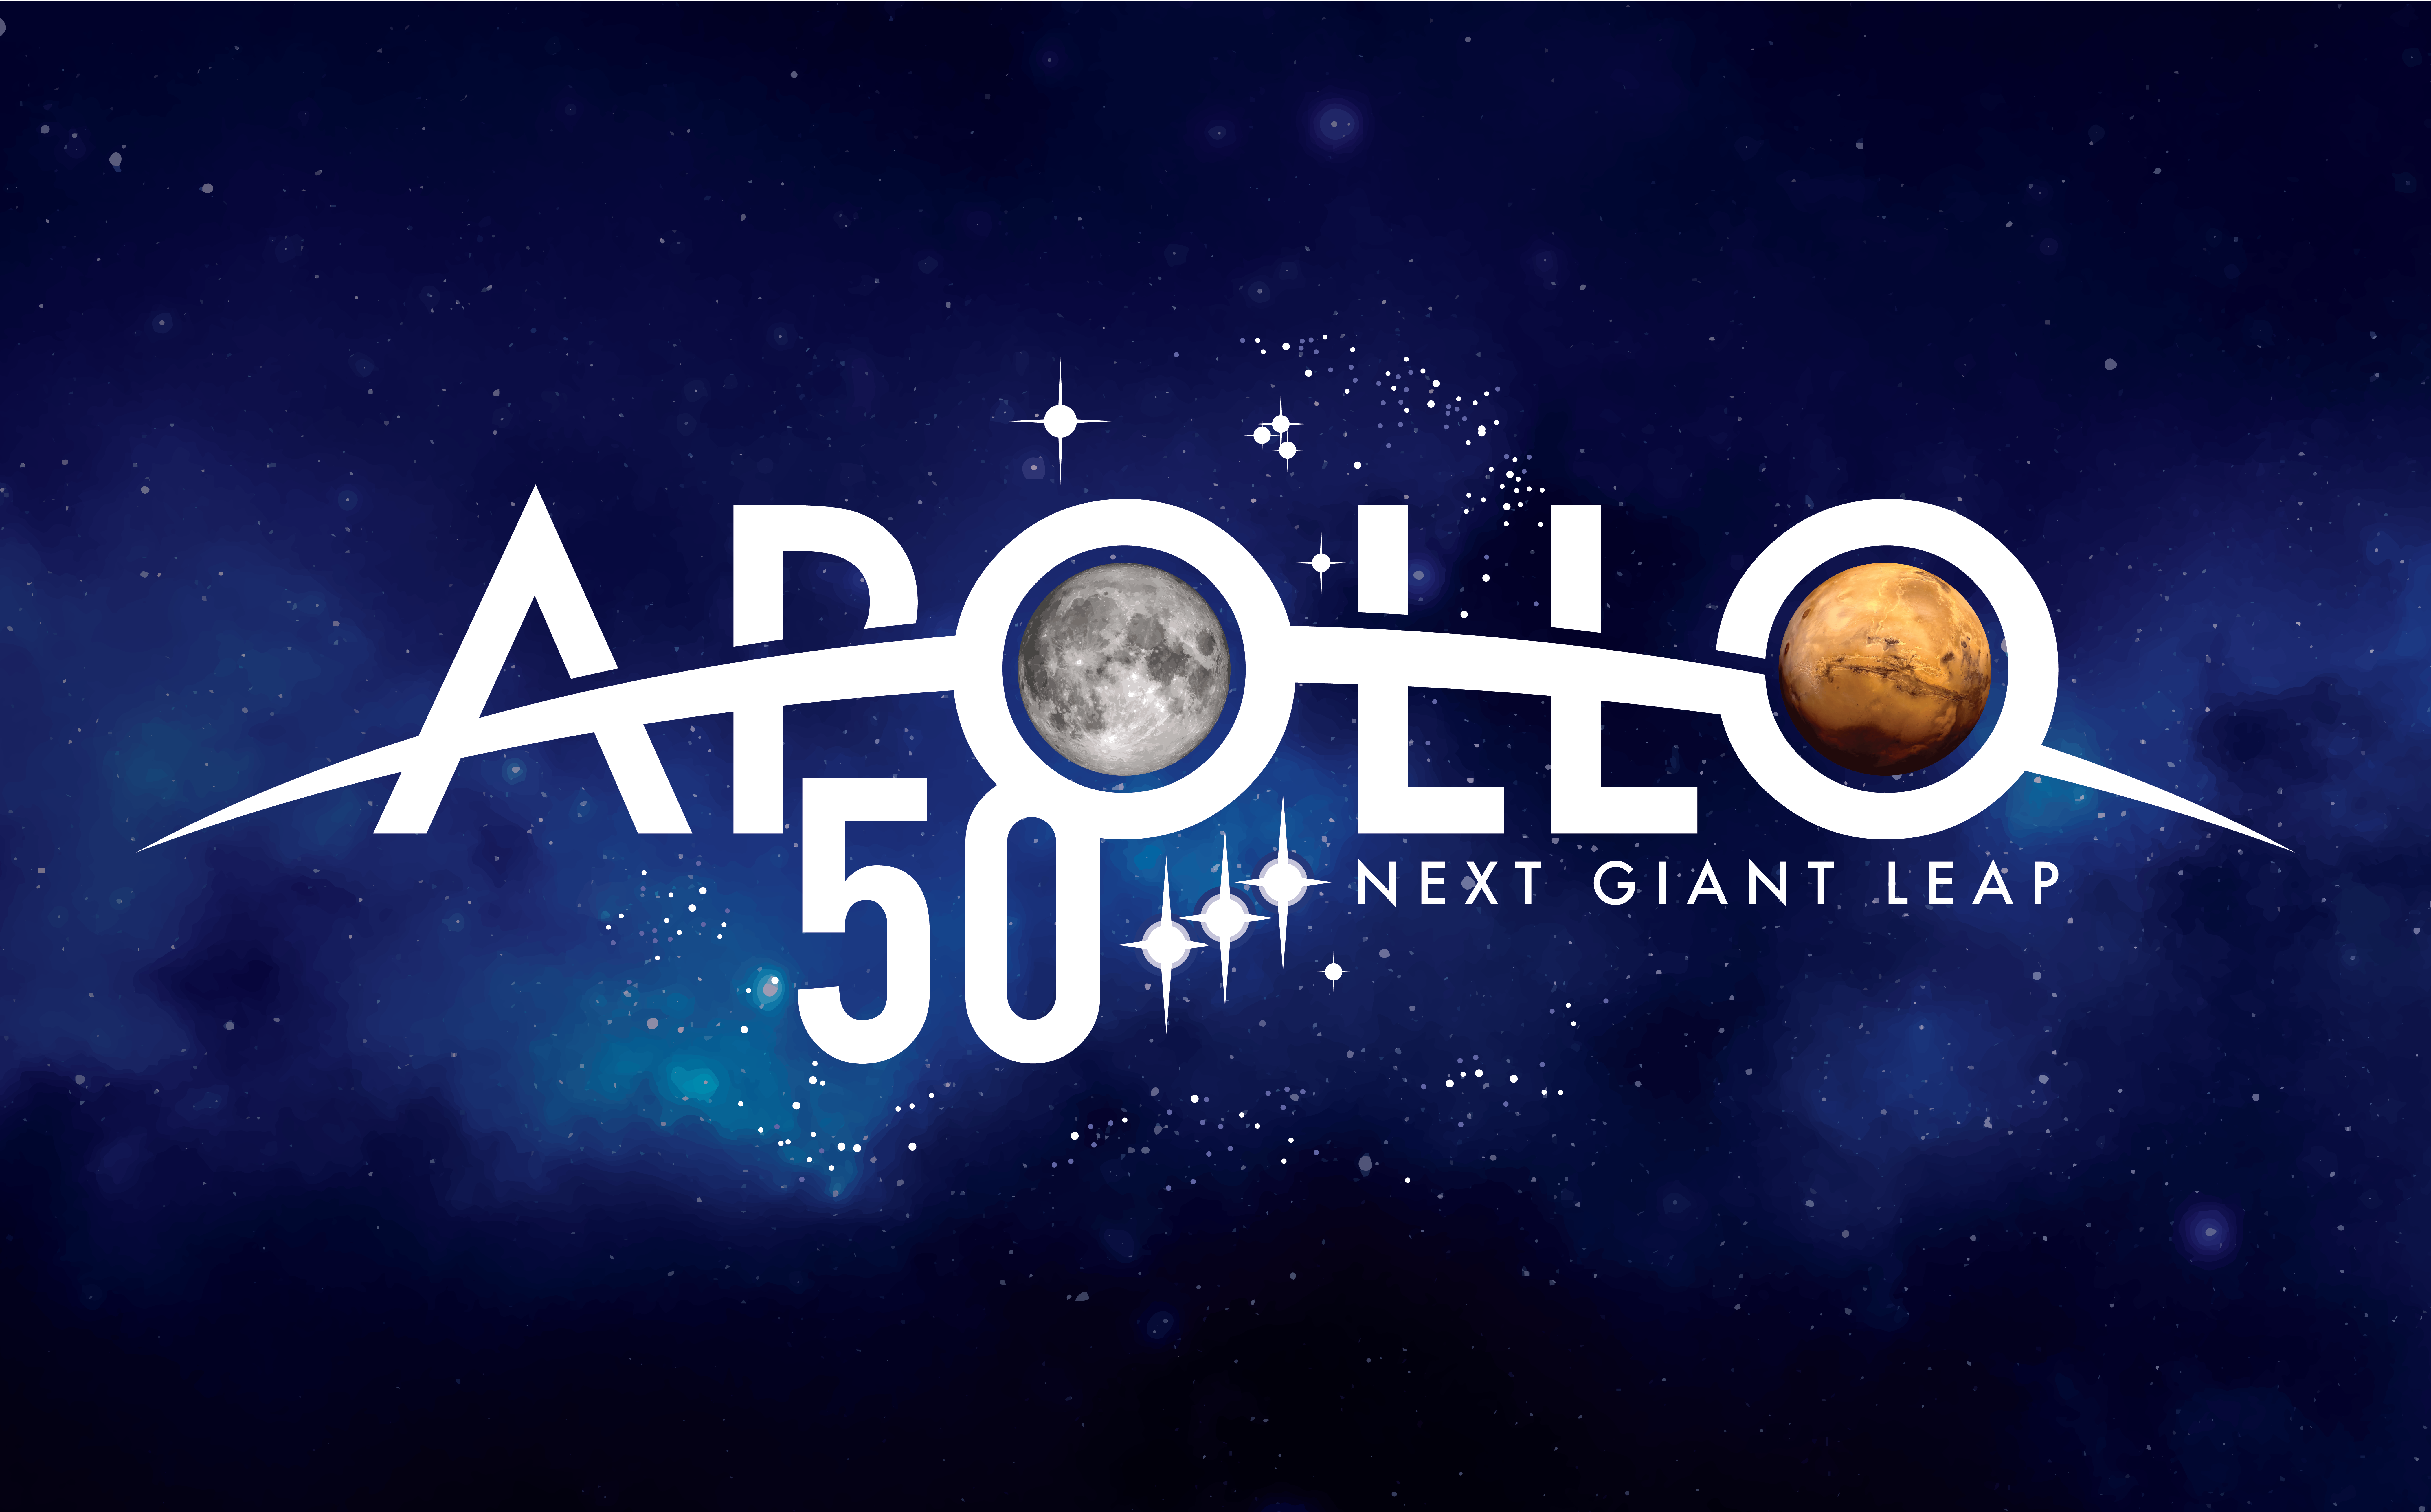 NASA Celebrates 50th Anniversary of Historic Moon Landing | NASA